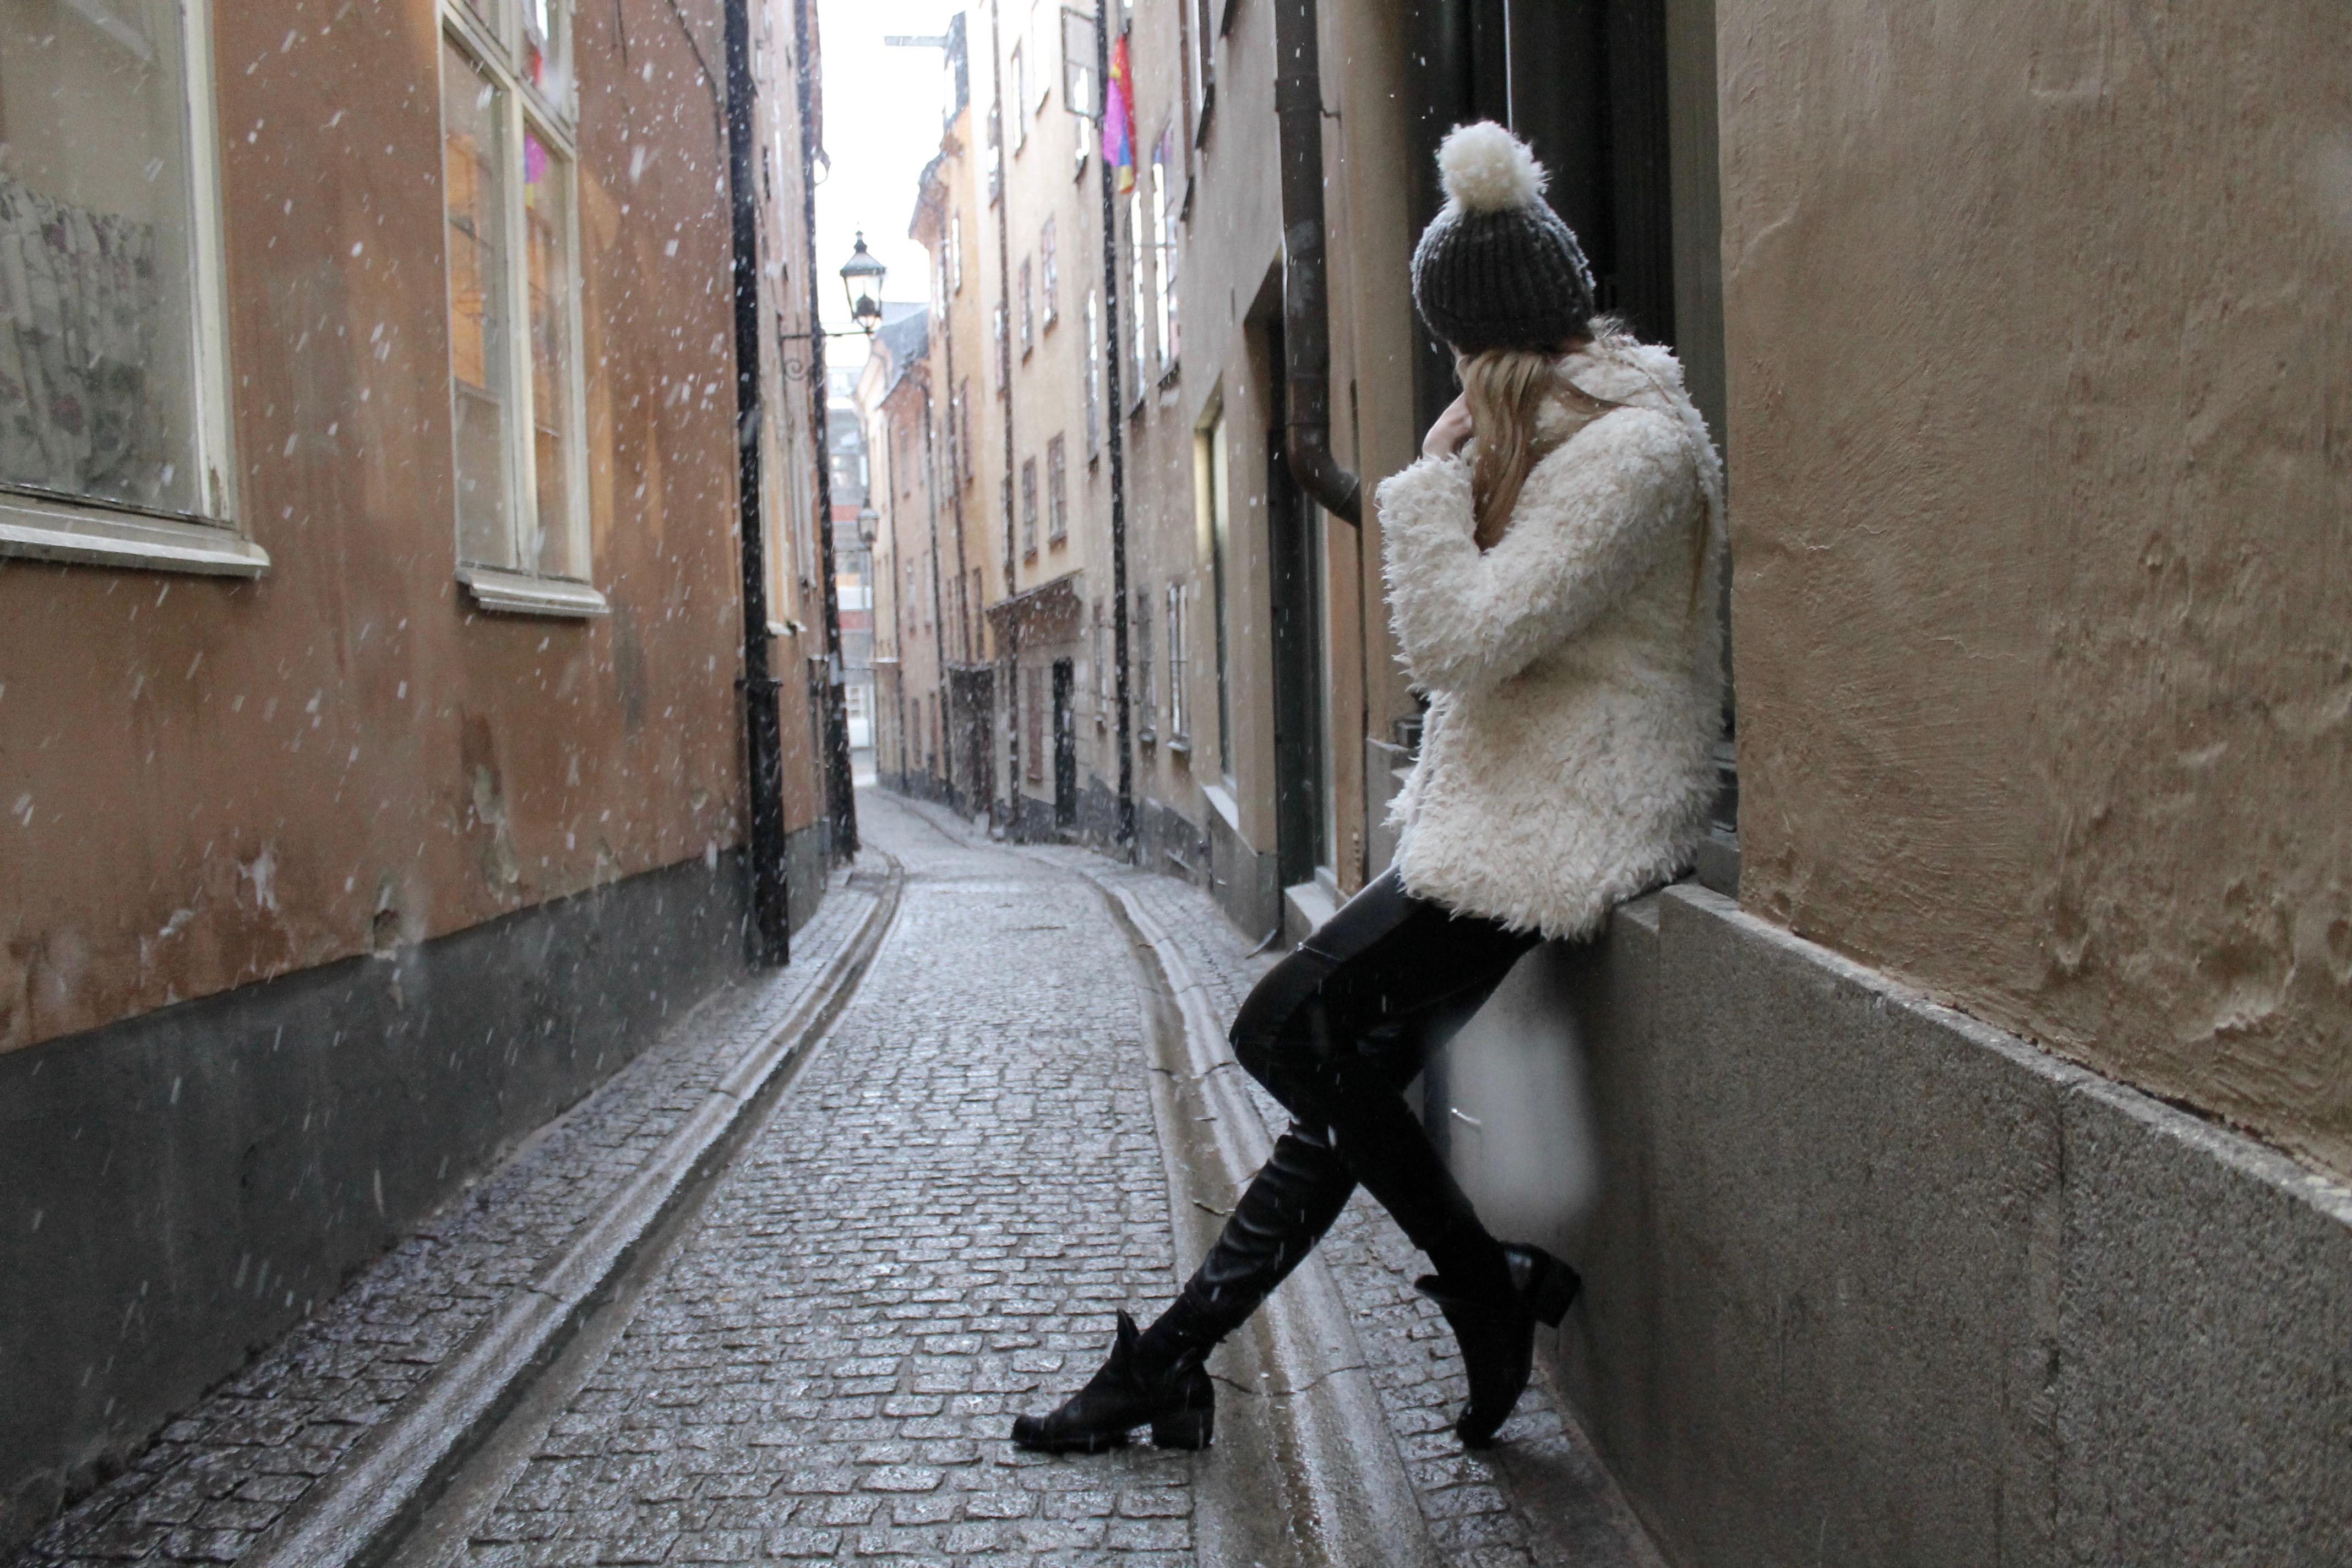 MON MODE, Fashion Blogger, Sofia Bulgaria, MonMode Blog, Travel Blog, Berlin Fashion Blogger, MonMode Blog